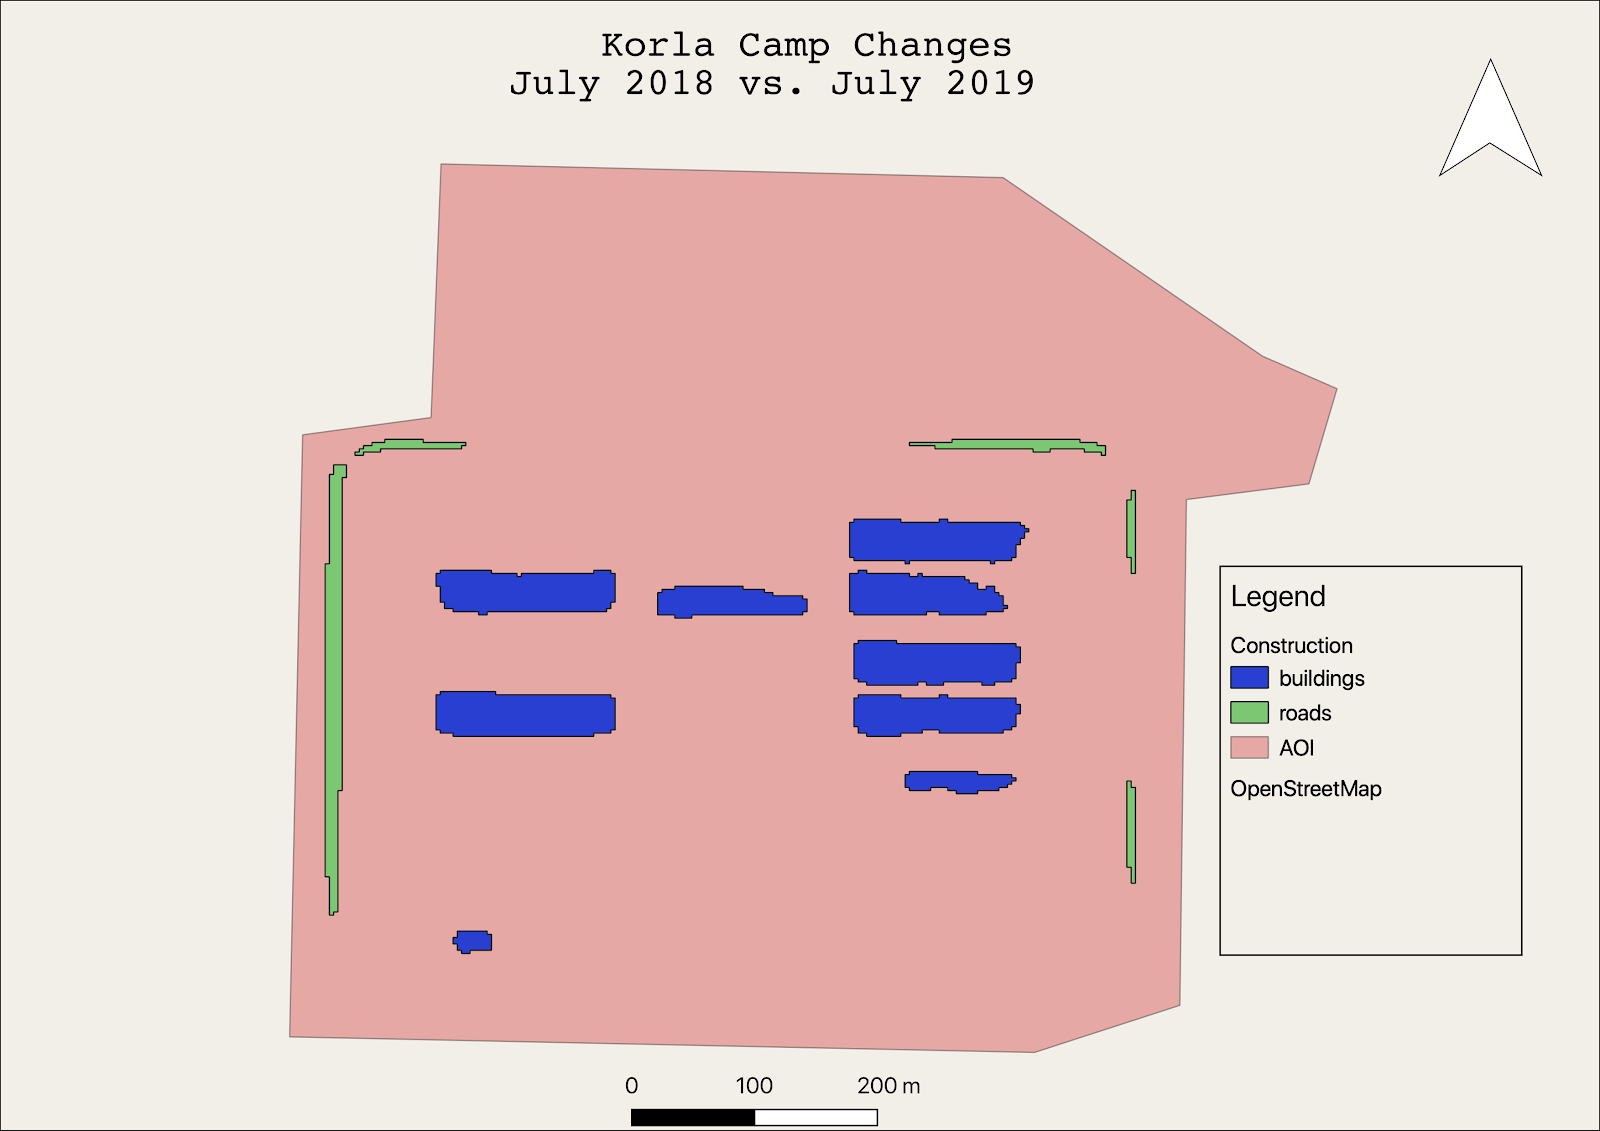 Korla re-education camp 2018 vs 2019